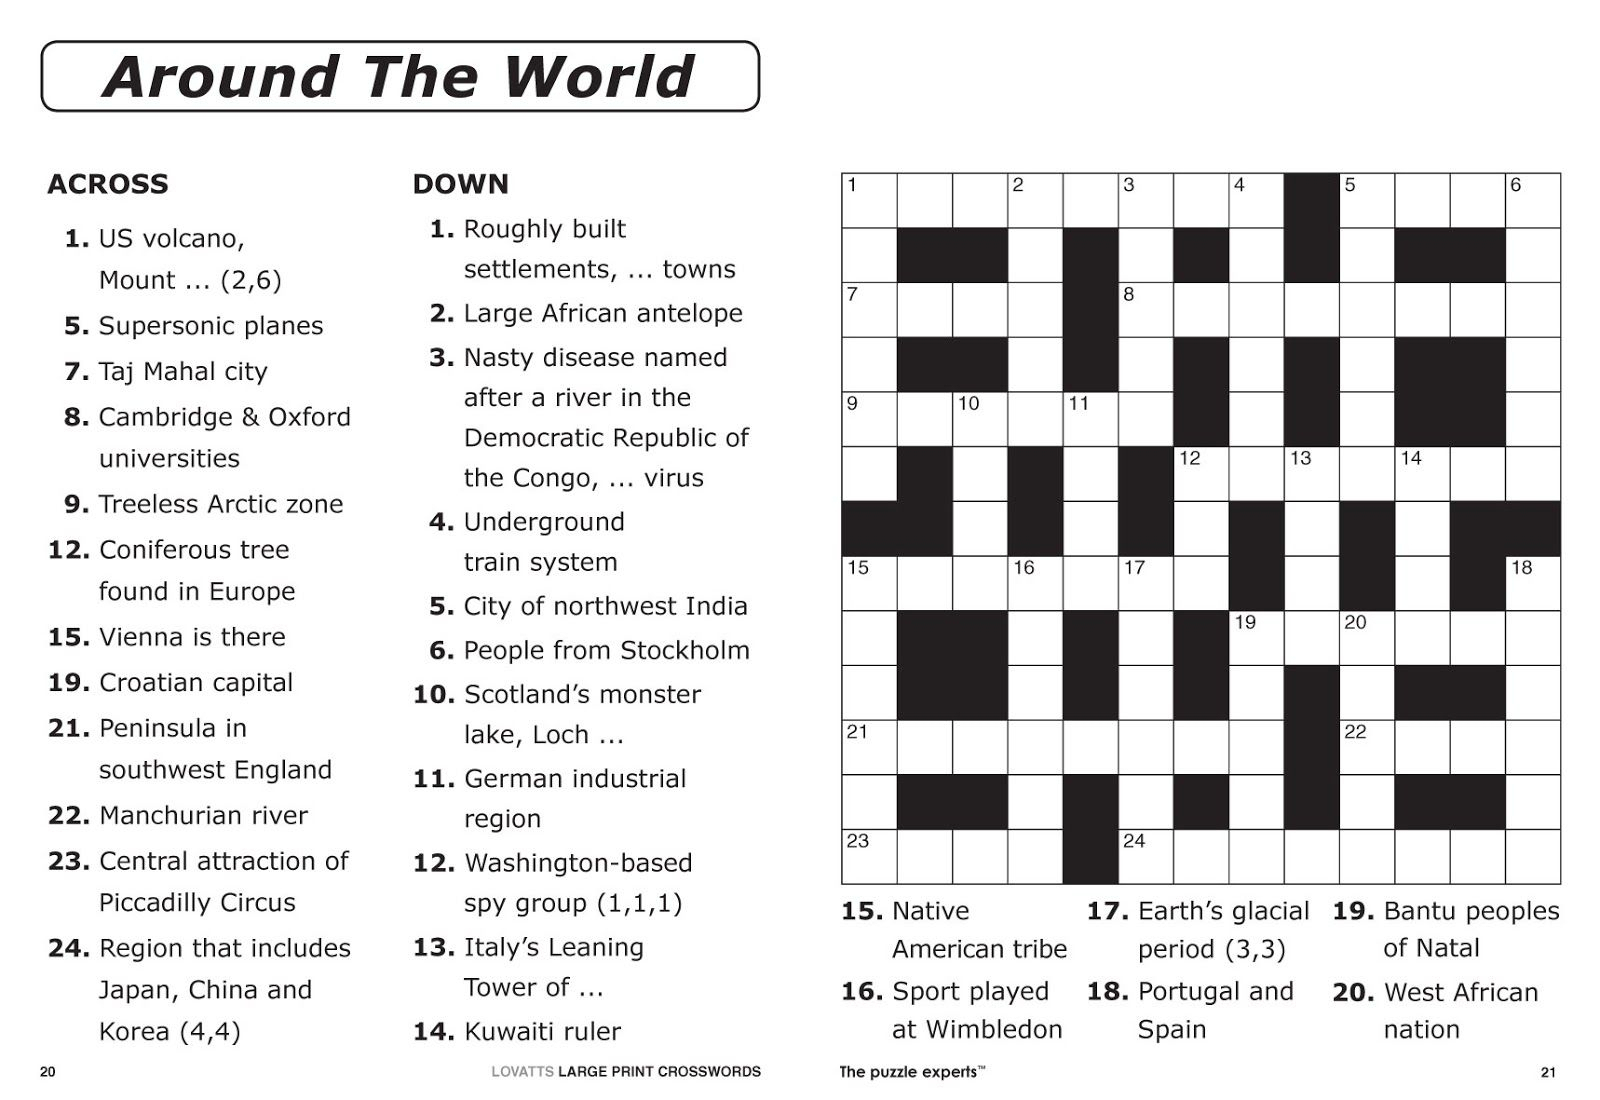 Free Printable Large Print Crossword Puzzles | M3U8 - Printable Easy Crossword Puzzles Pdf